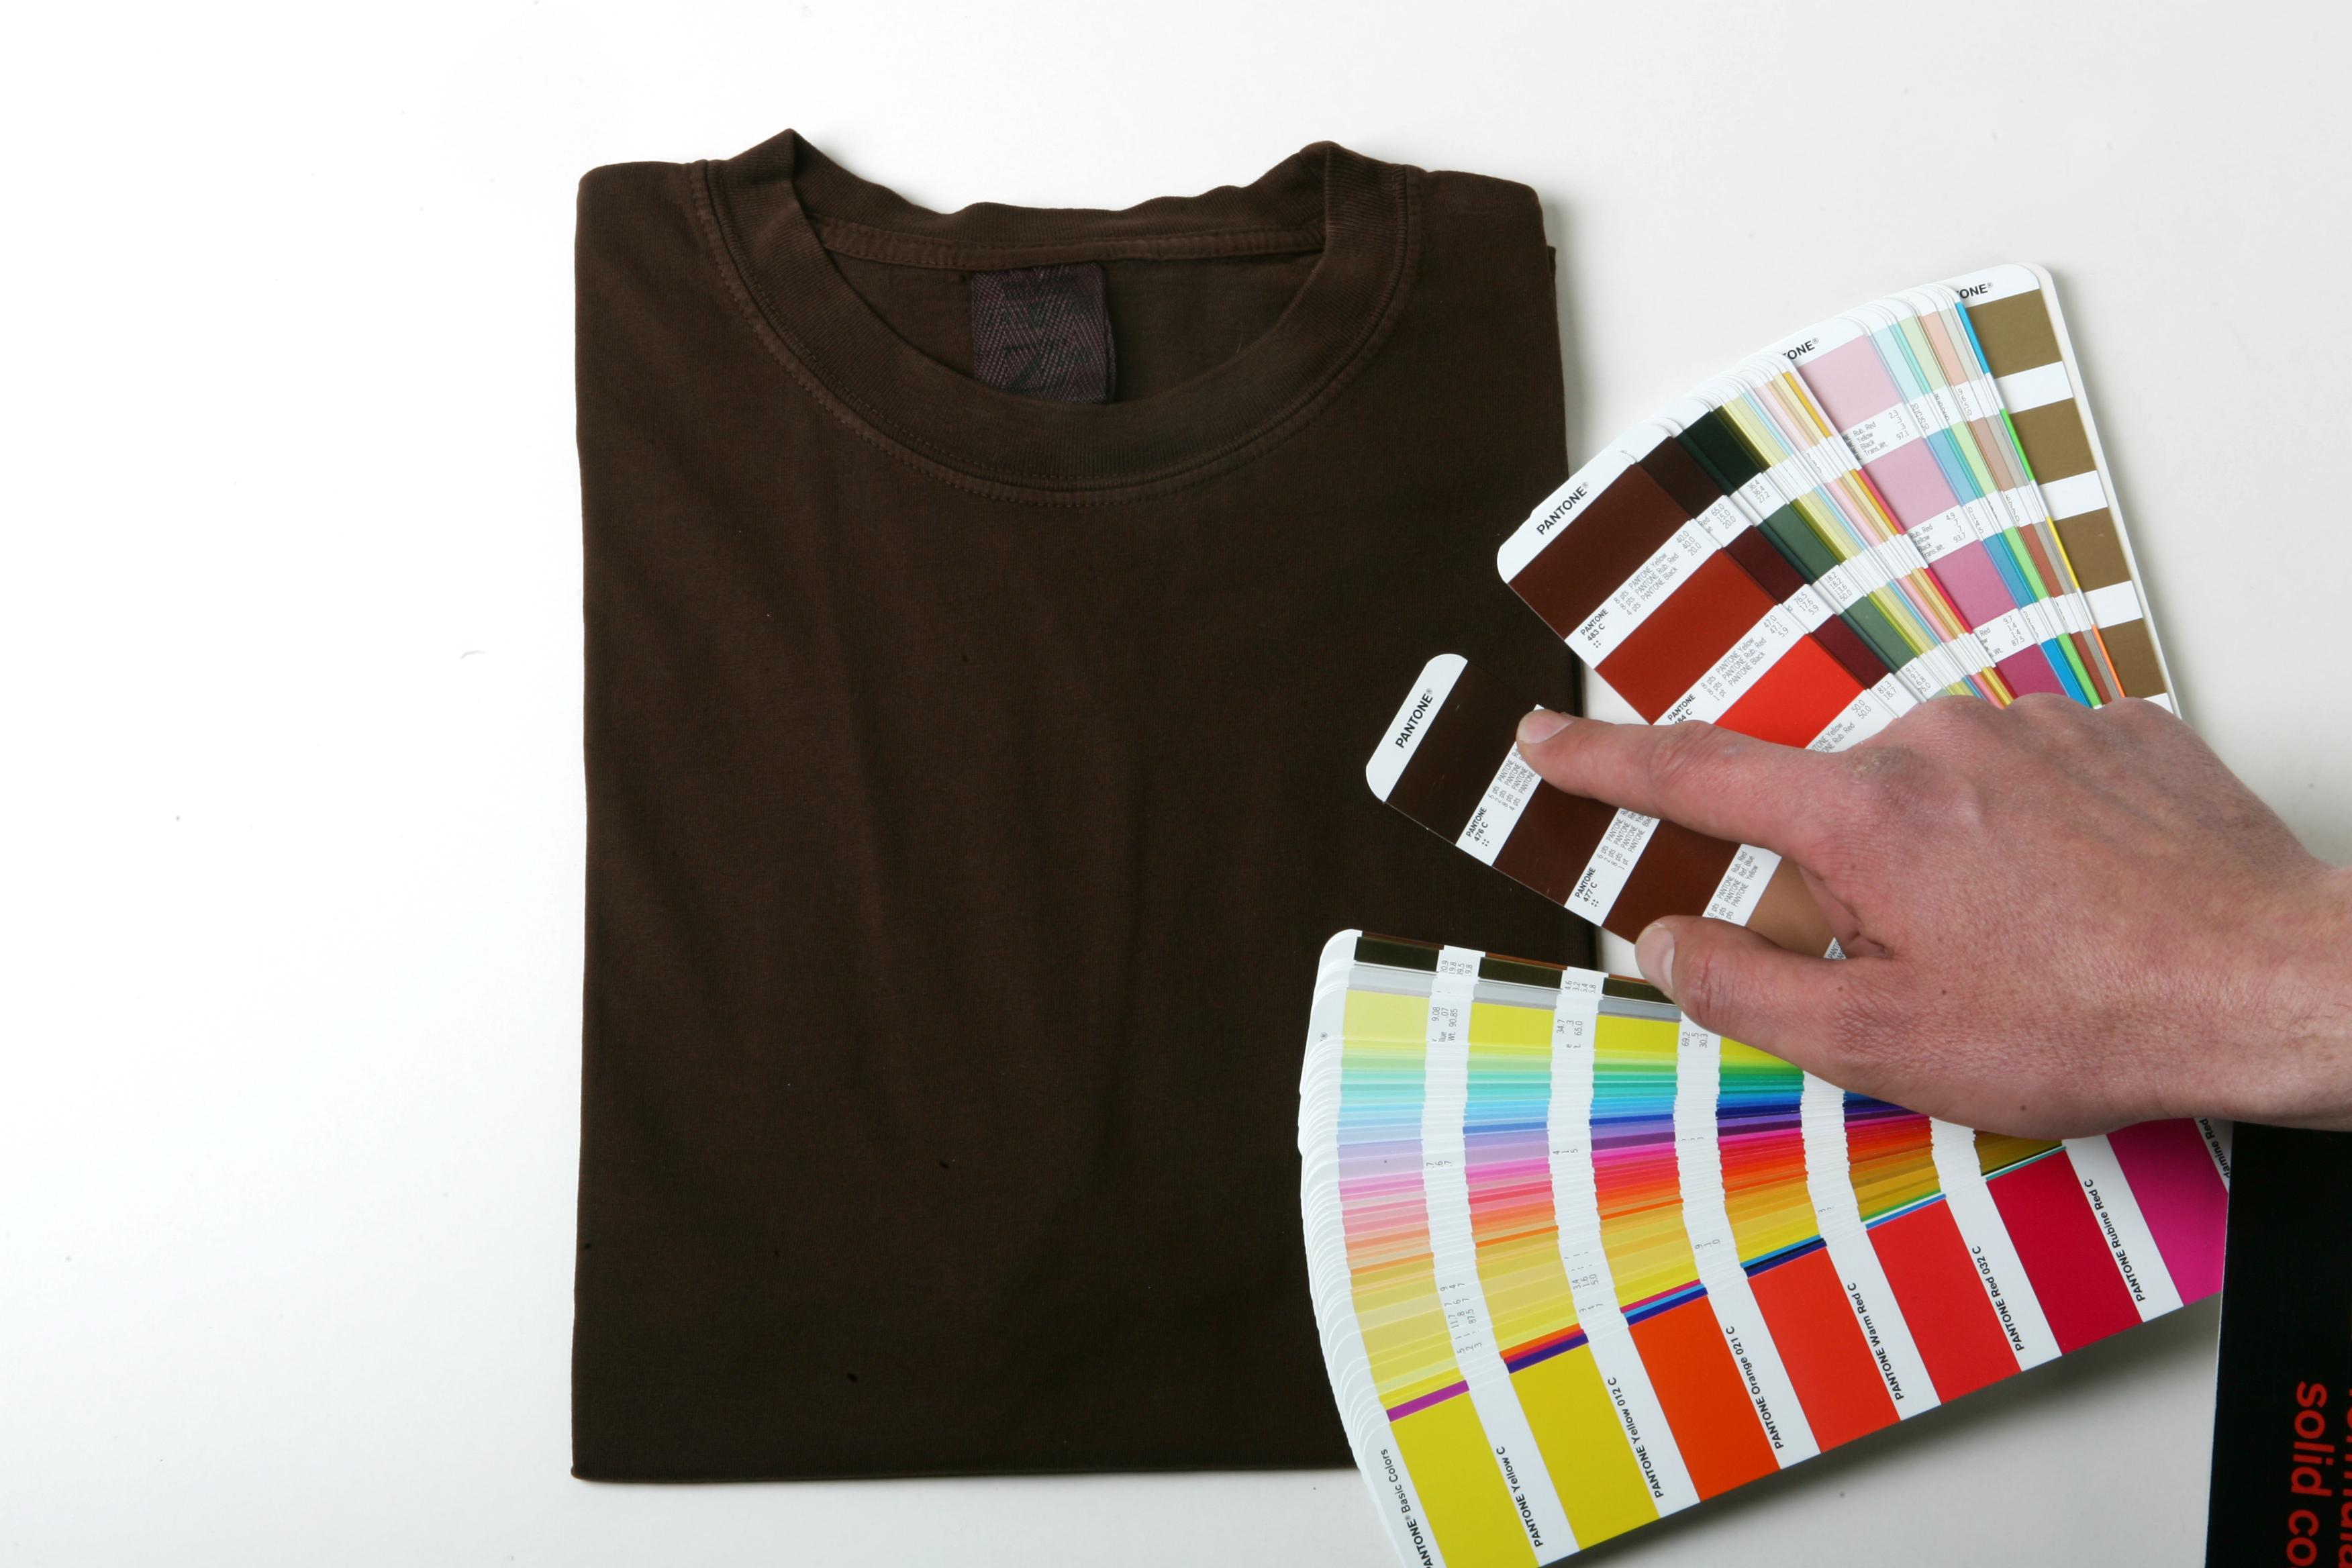 Pantone dyed Tshirt.